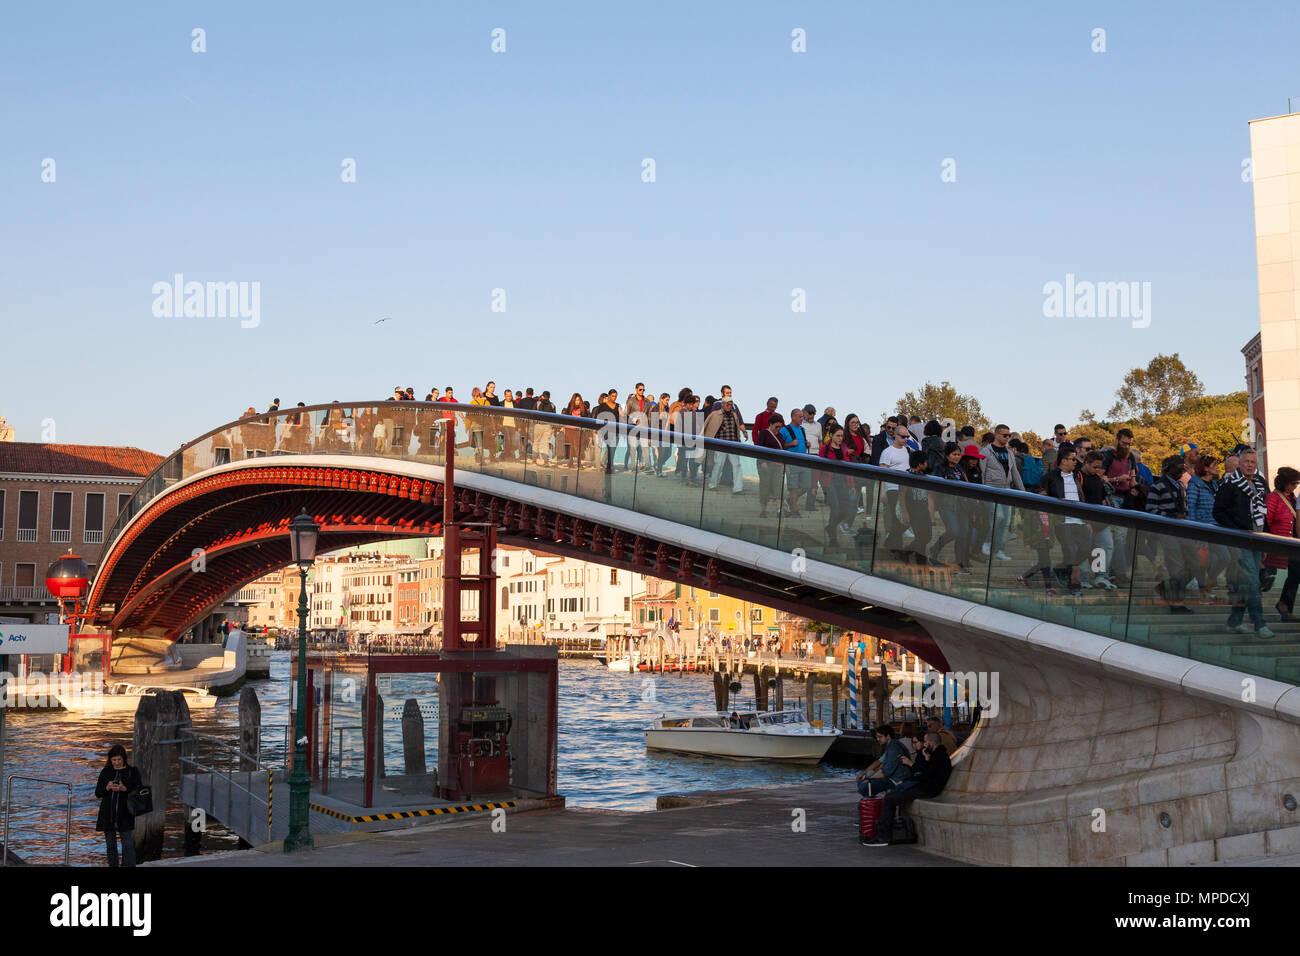 People crossing the Calatrava Bridge (Ponte della Costituzione), Grand Canal at sunset, dusk, golden hour, to Piazzale Roma, Venice,  Veneto, Italy - Stock Image